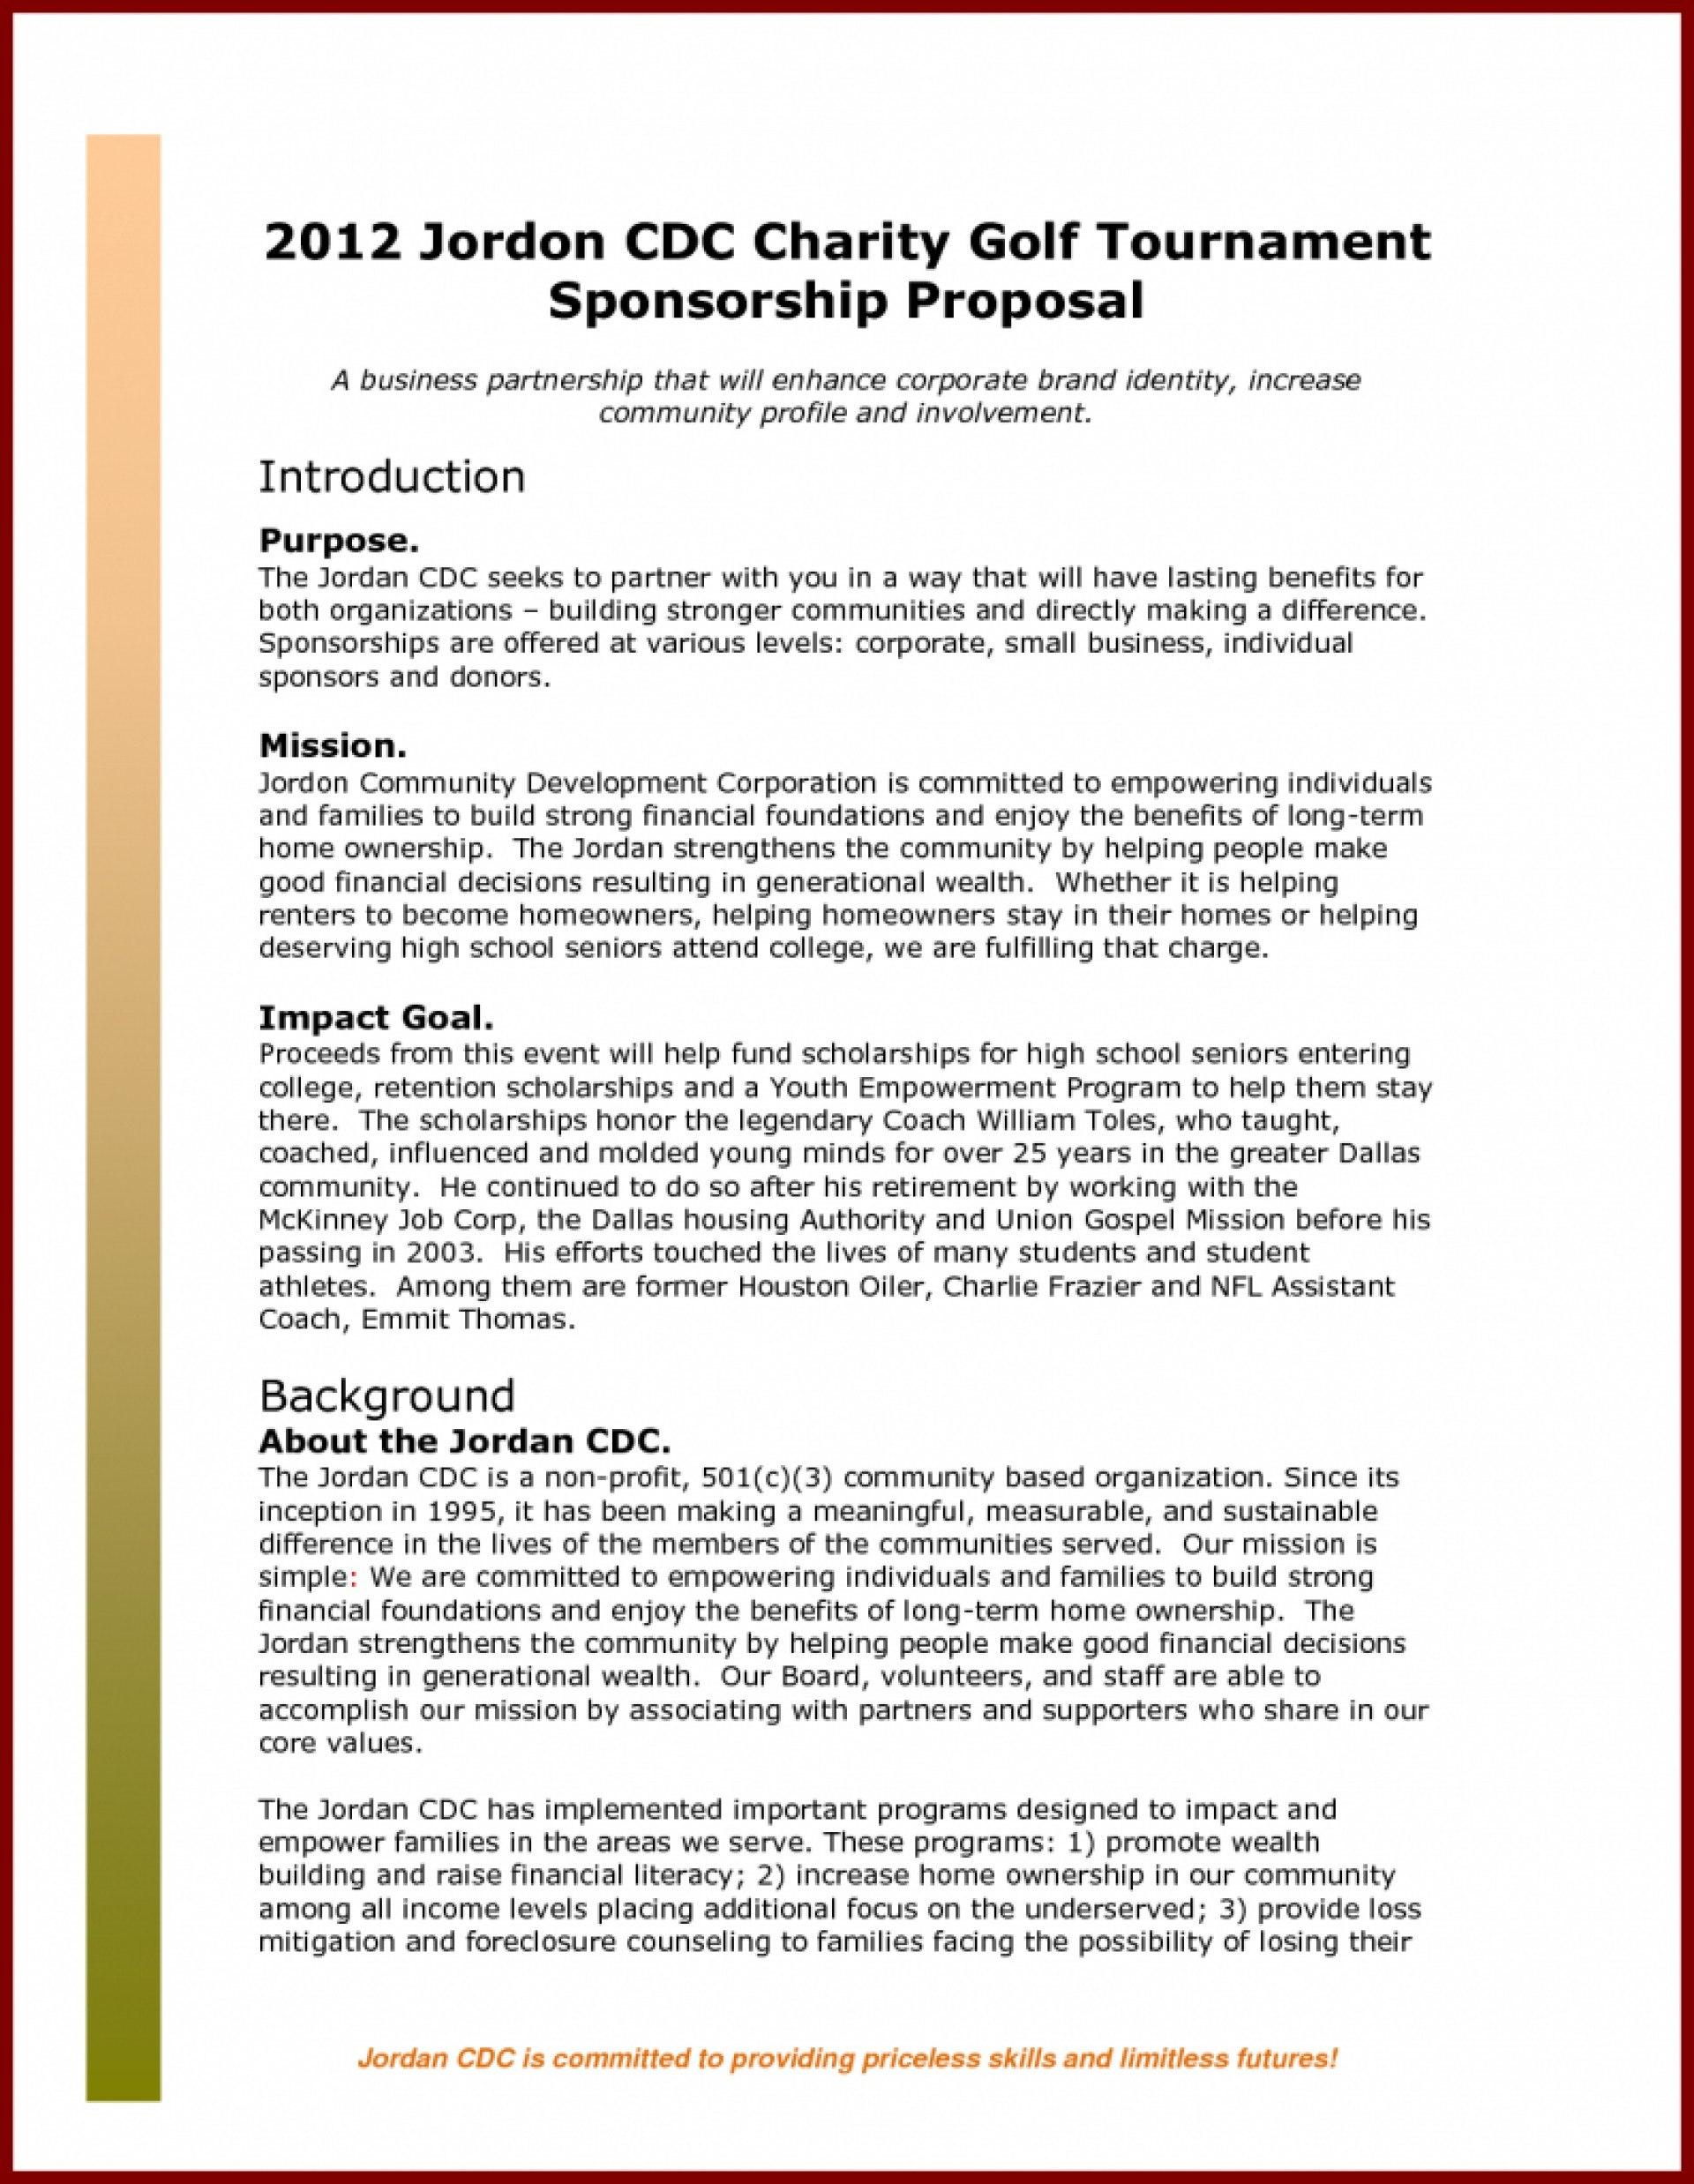 Event Sponsorship Proposal Template Ideas Sponso Corporate Throughout Corporate Sponsorship Proposal Template